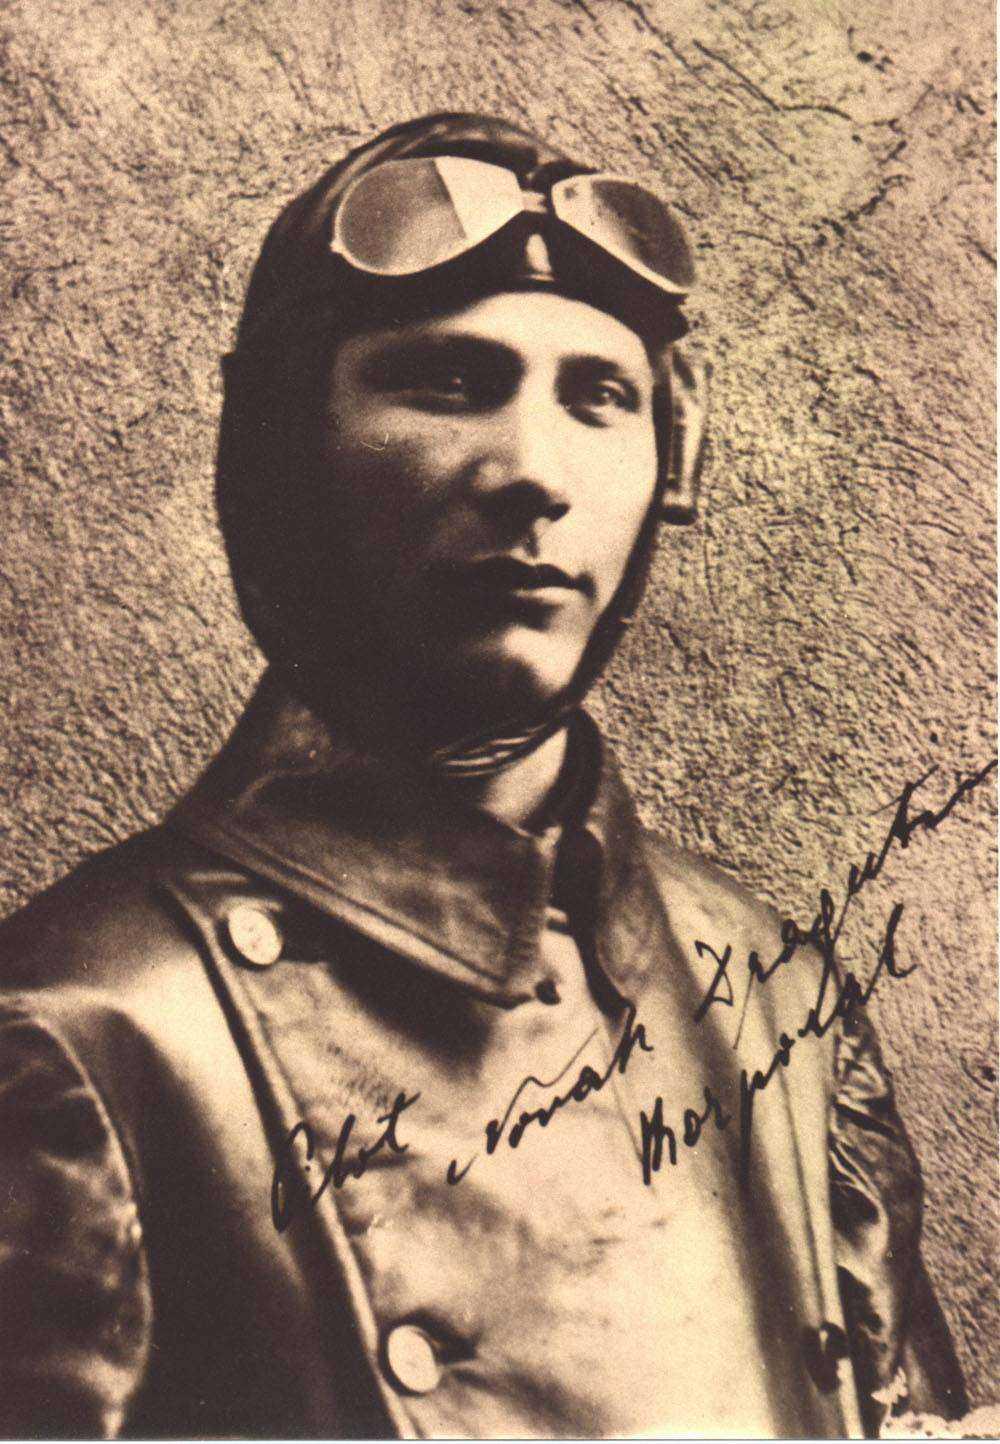 Dragutin Novak